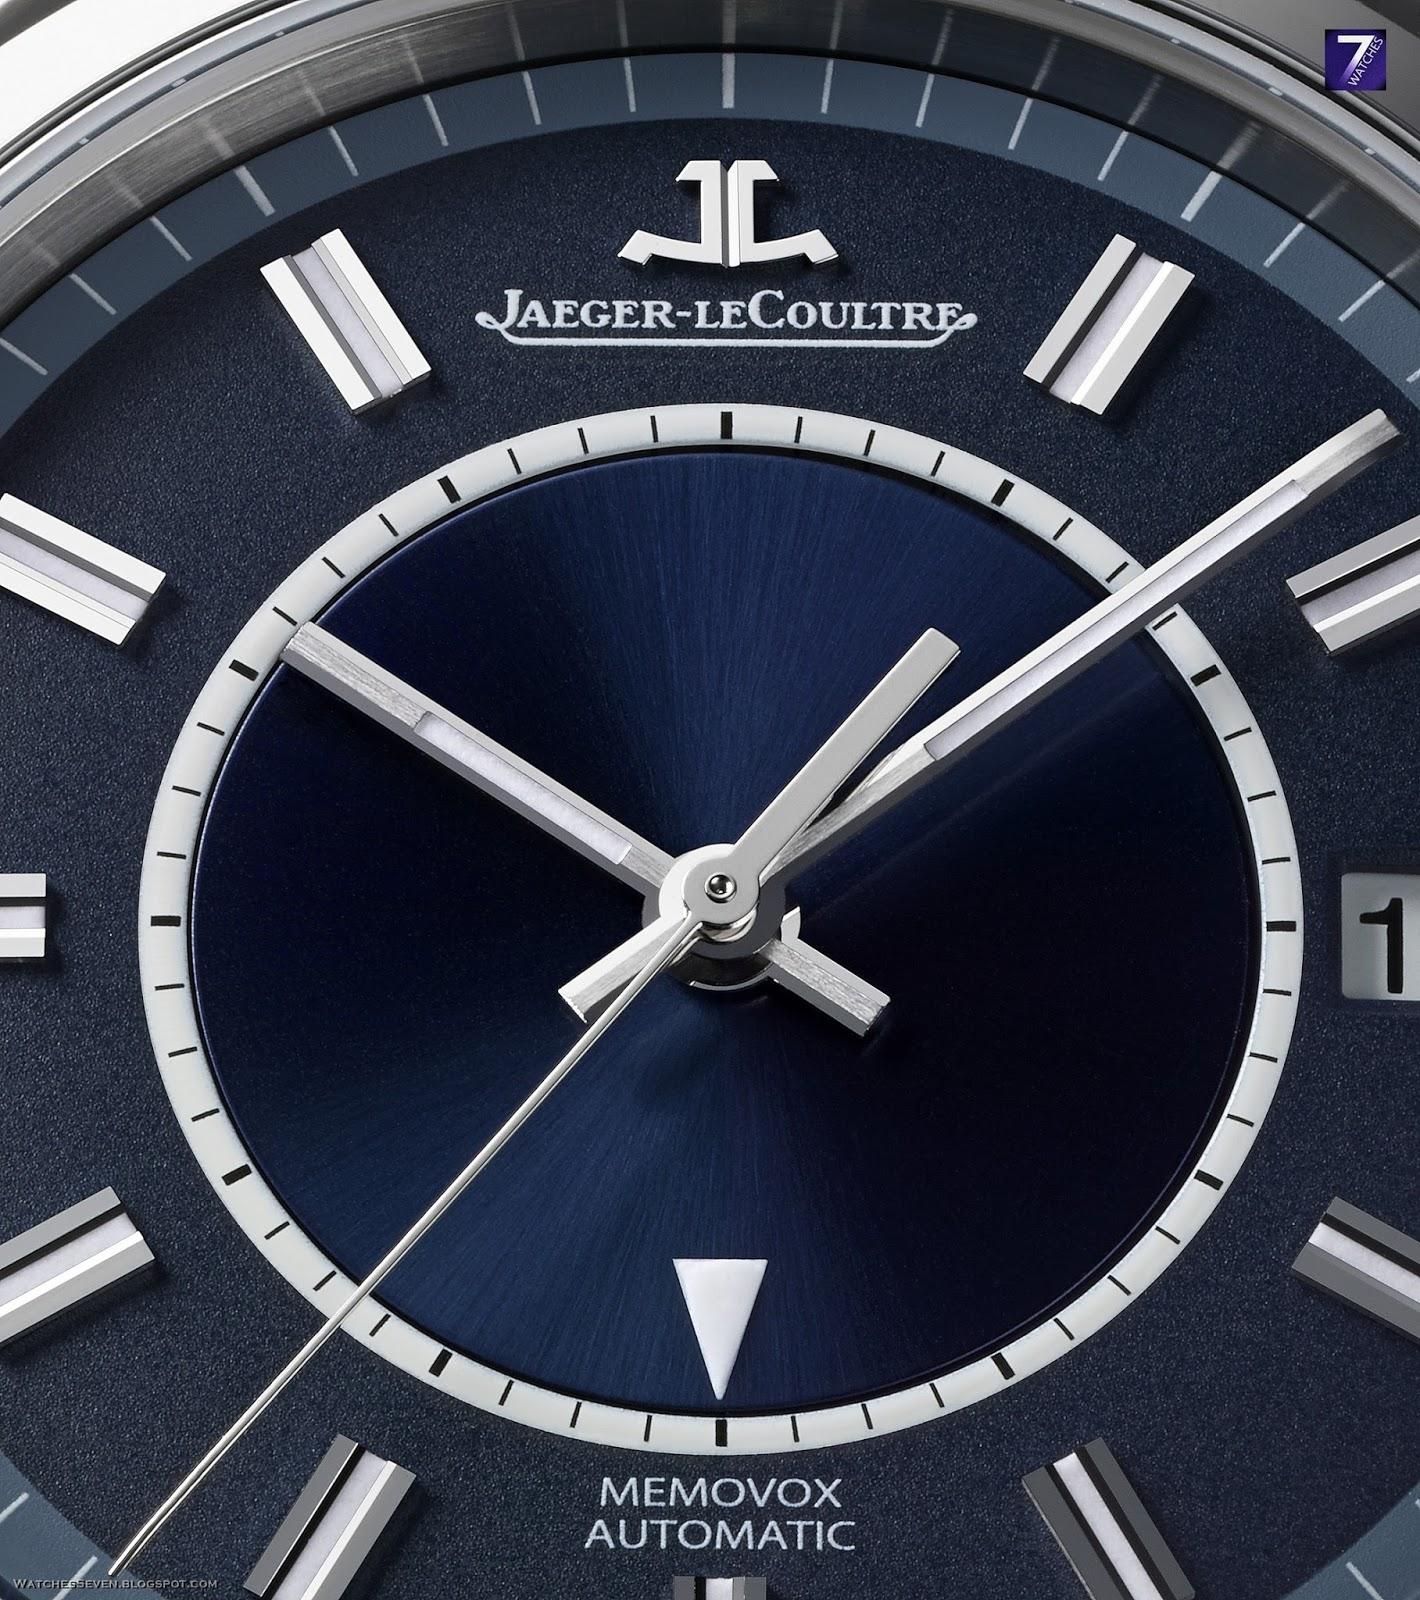 Jaeger-LeCoultre%2B%25E2%2580%2593%2BMas